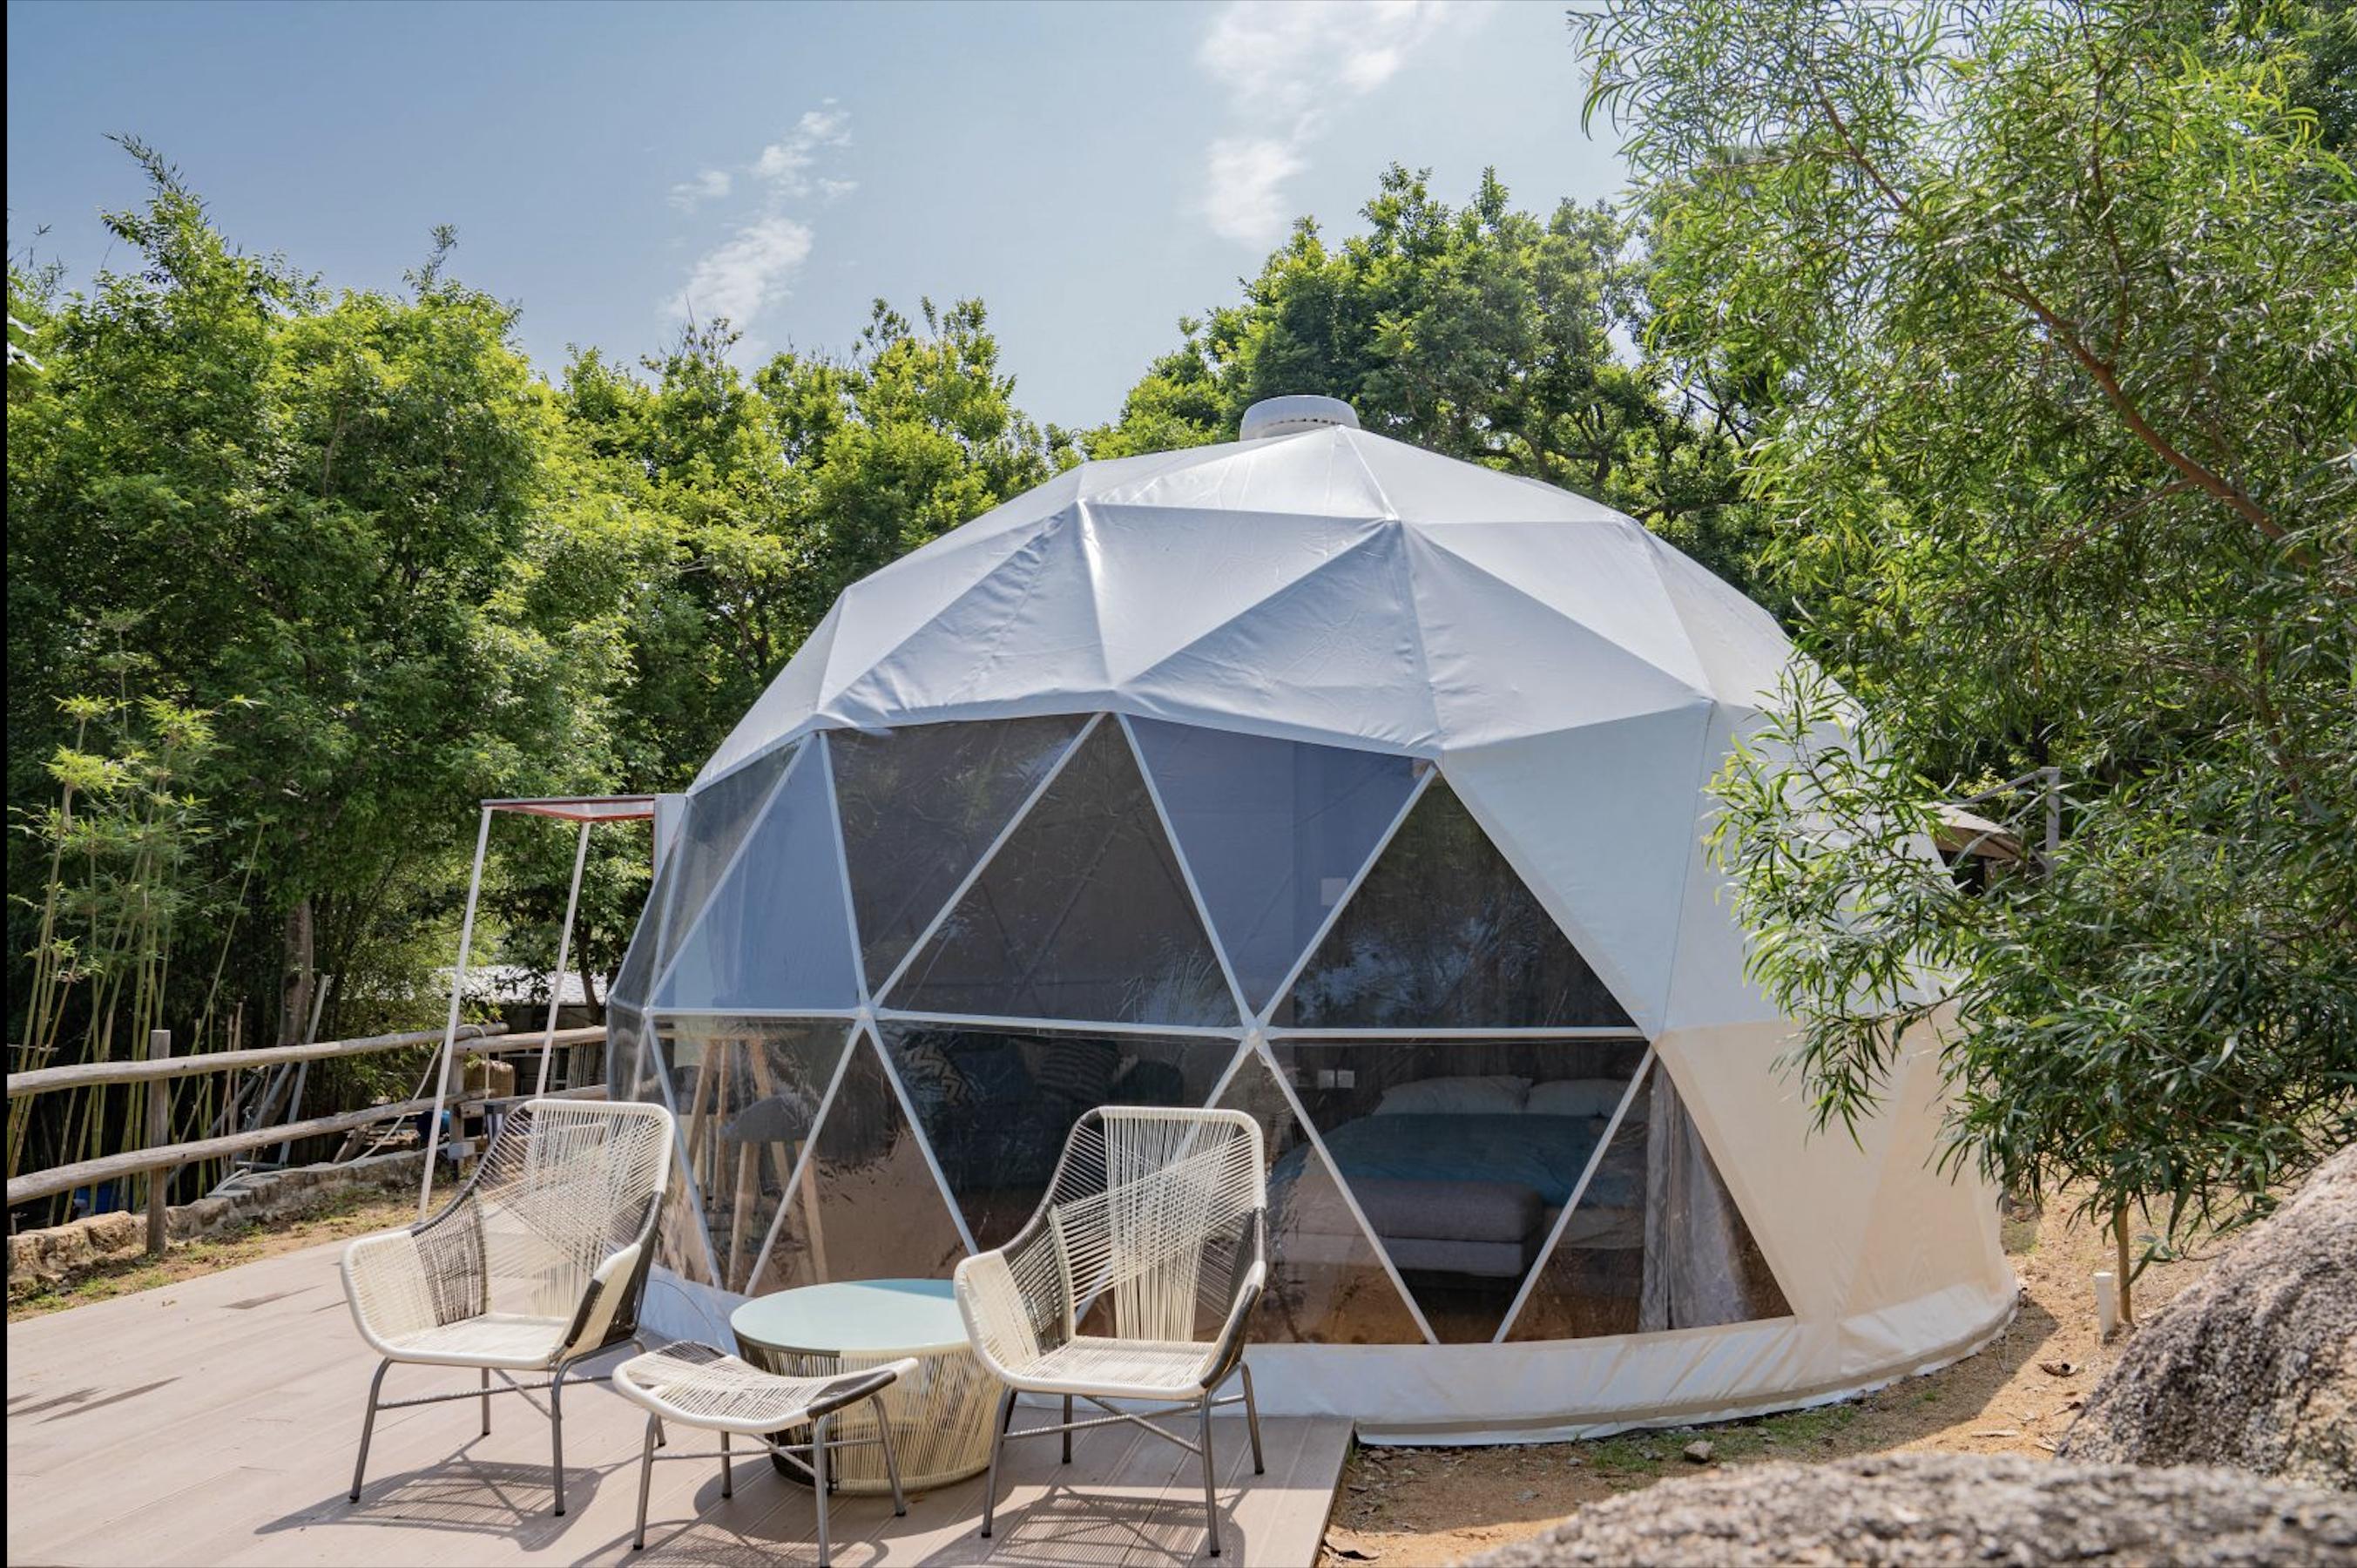 Saiyuen Camping & Adventure Park